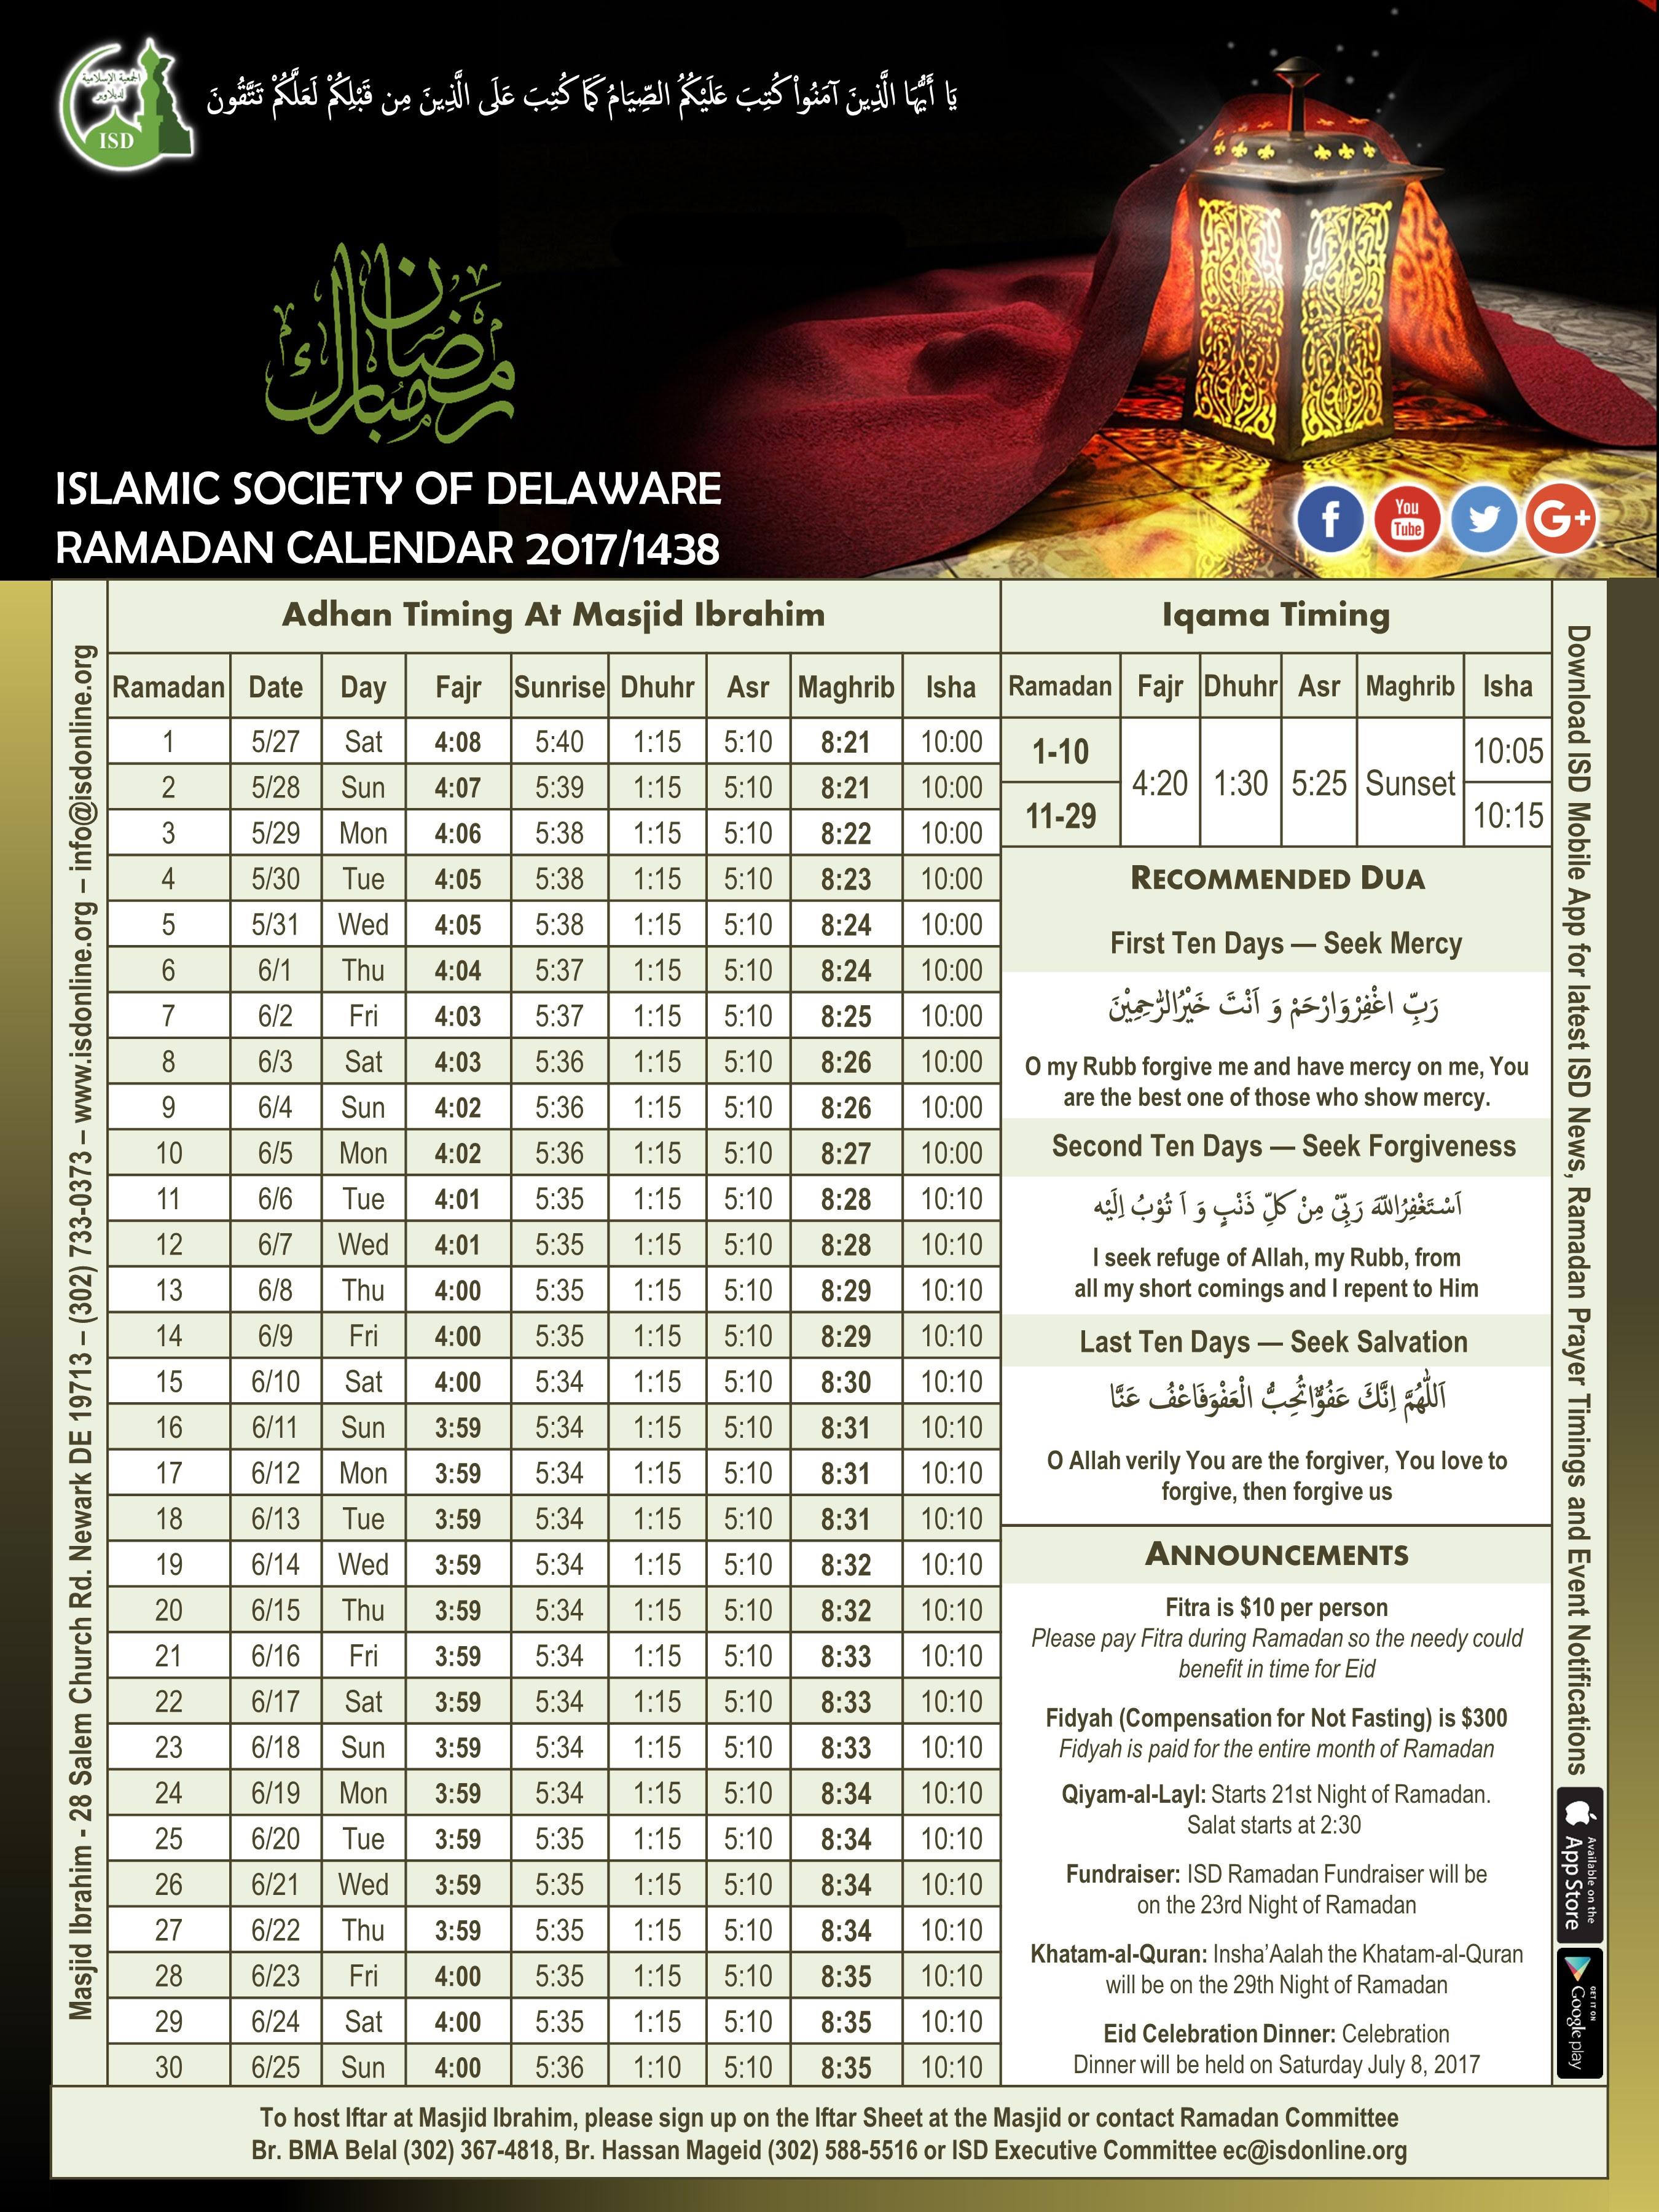 RamadanSchedule2017